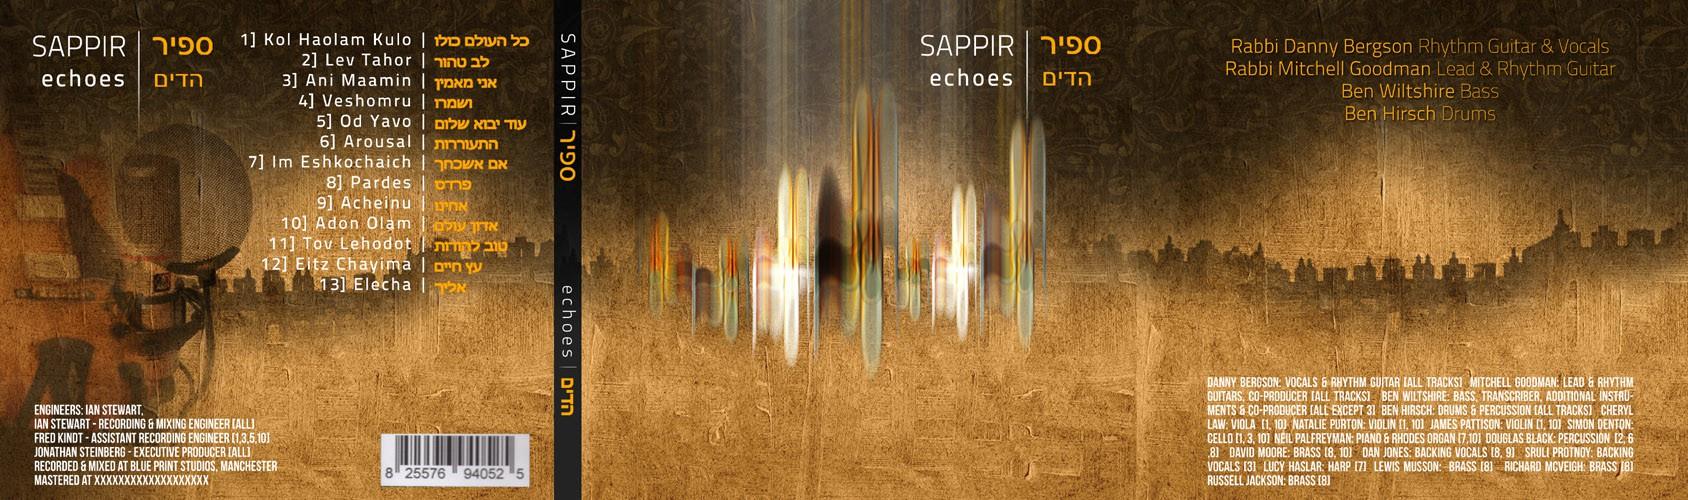 Debut Album Artistic Concept and CD Design